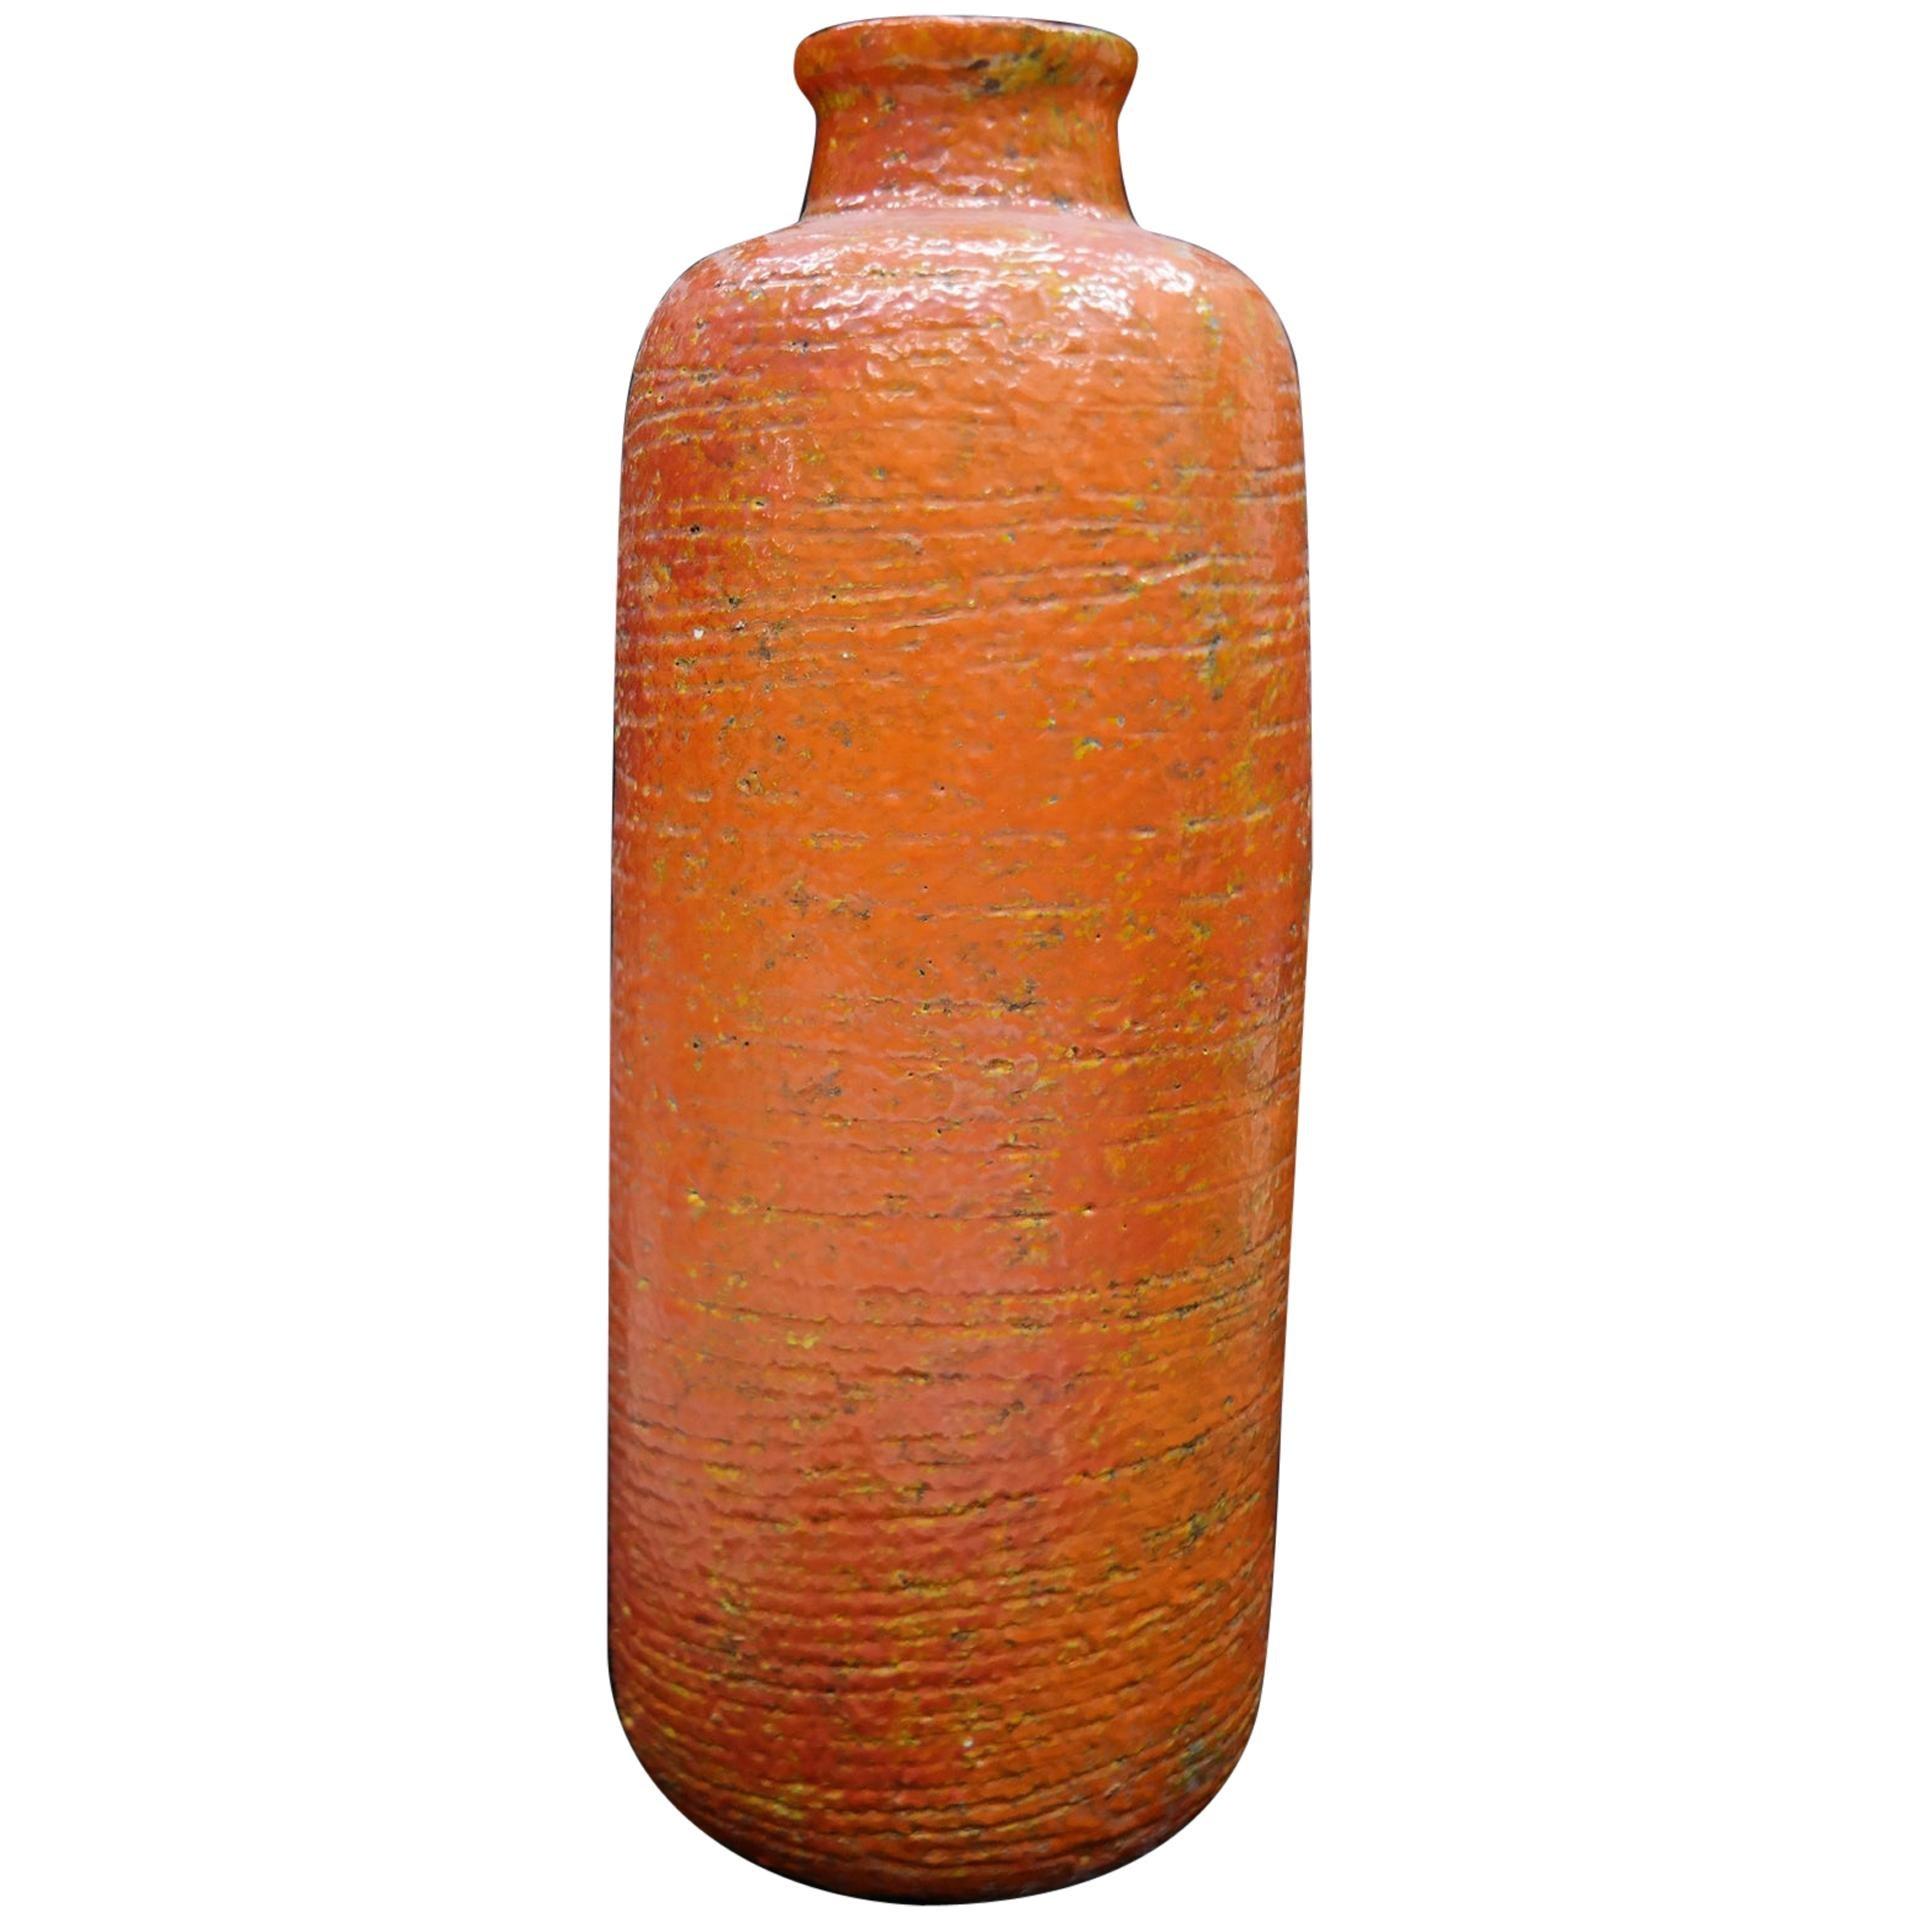 Very Large Ceramic Midcentury Floor Vase, 1970s